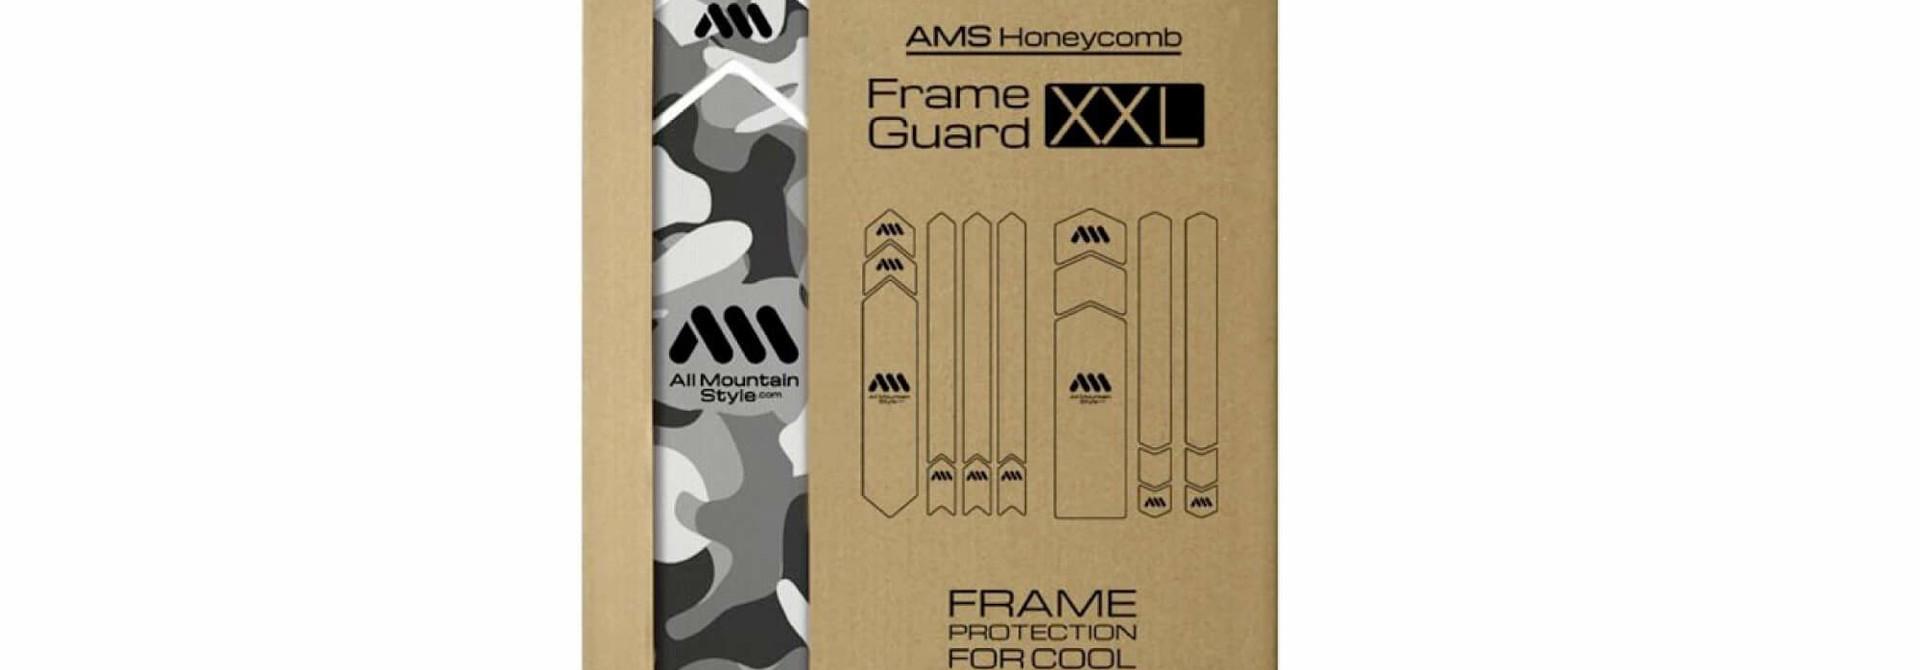 XX-Large Full Frame Protection Wrap